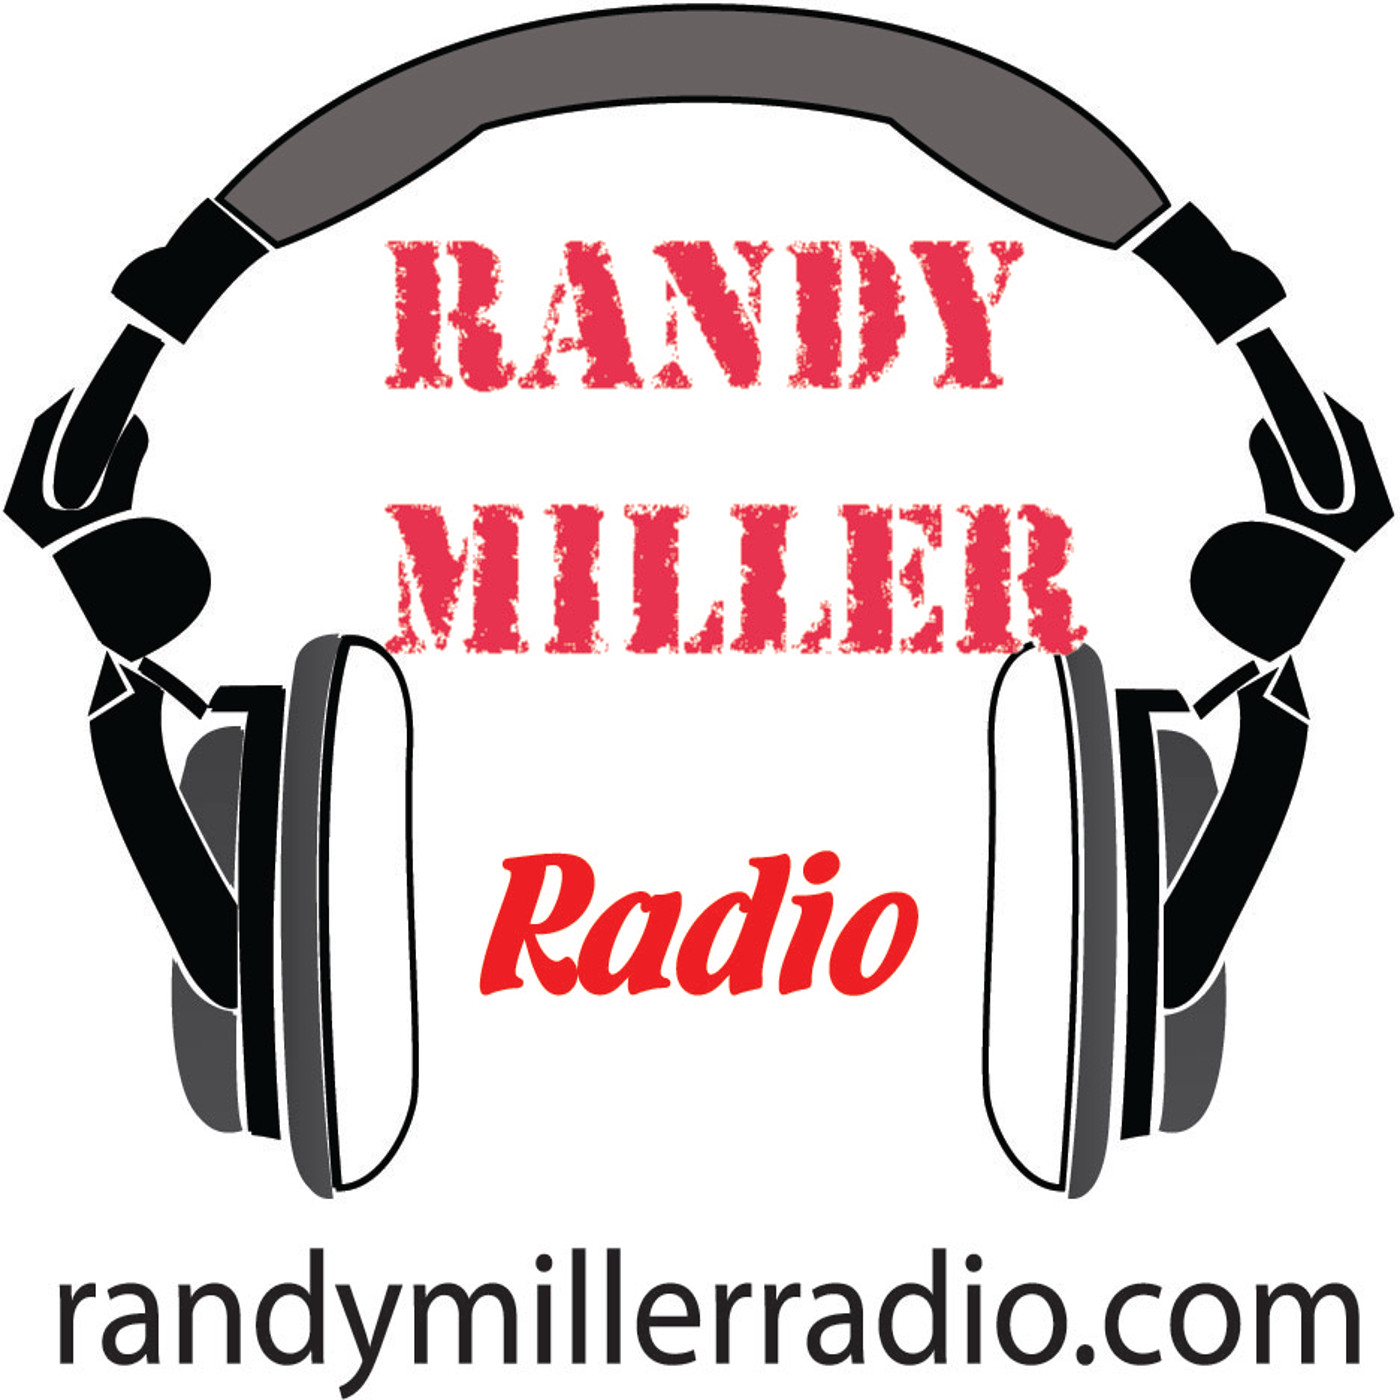 Randy Miller Radio show art